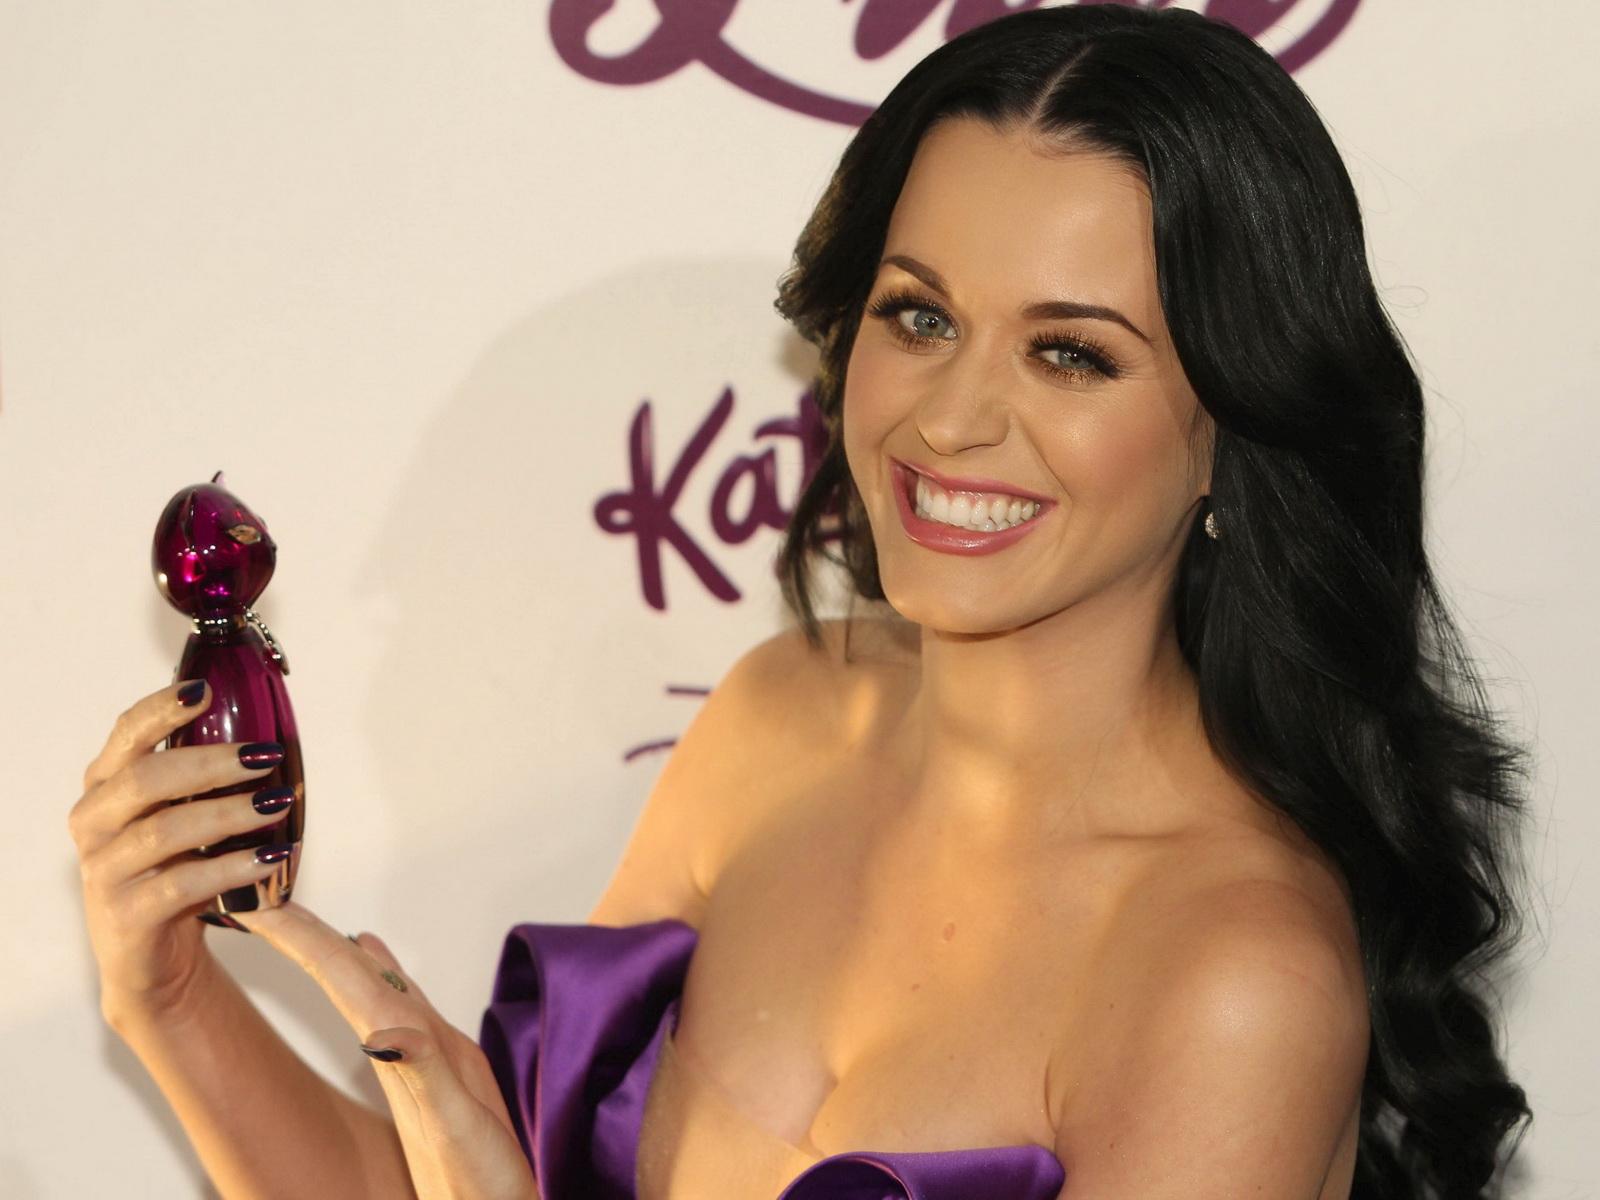 http://1.bp.blogspot.com/_Jgc-vQ1t70k/TU_vwK0gjII/AAAAAAAAAv8/suUd4-r97Qg/s1600/Katy_Perry_cleavage_areola_slip_cleavage_1.jpg